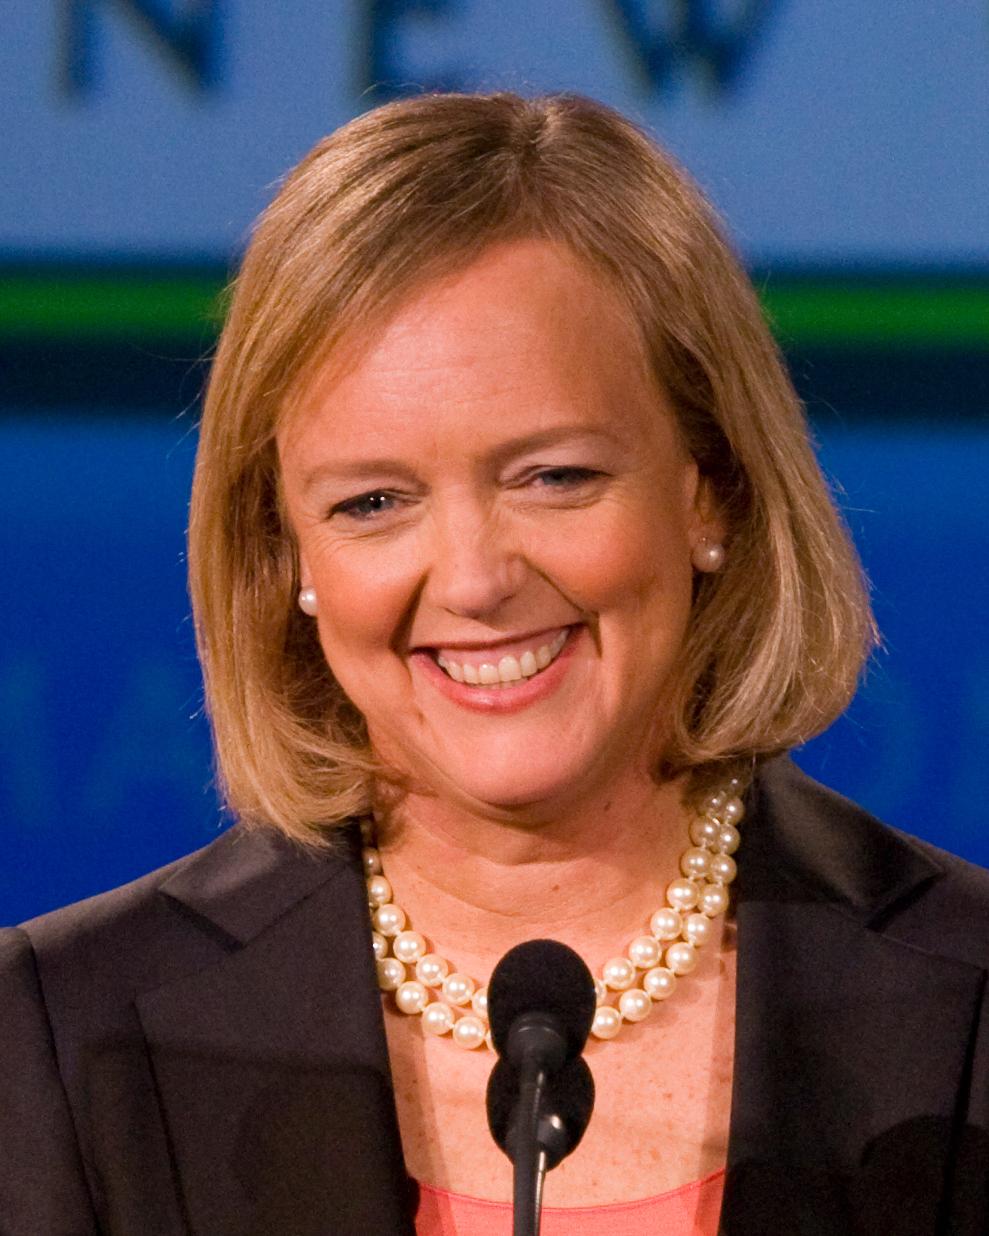 Meg Whitman - Former CEO of Hewlett Packard